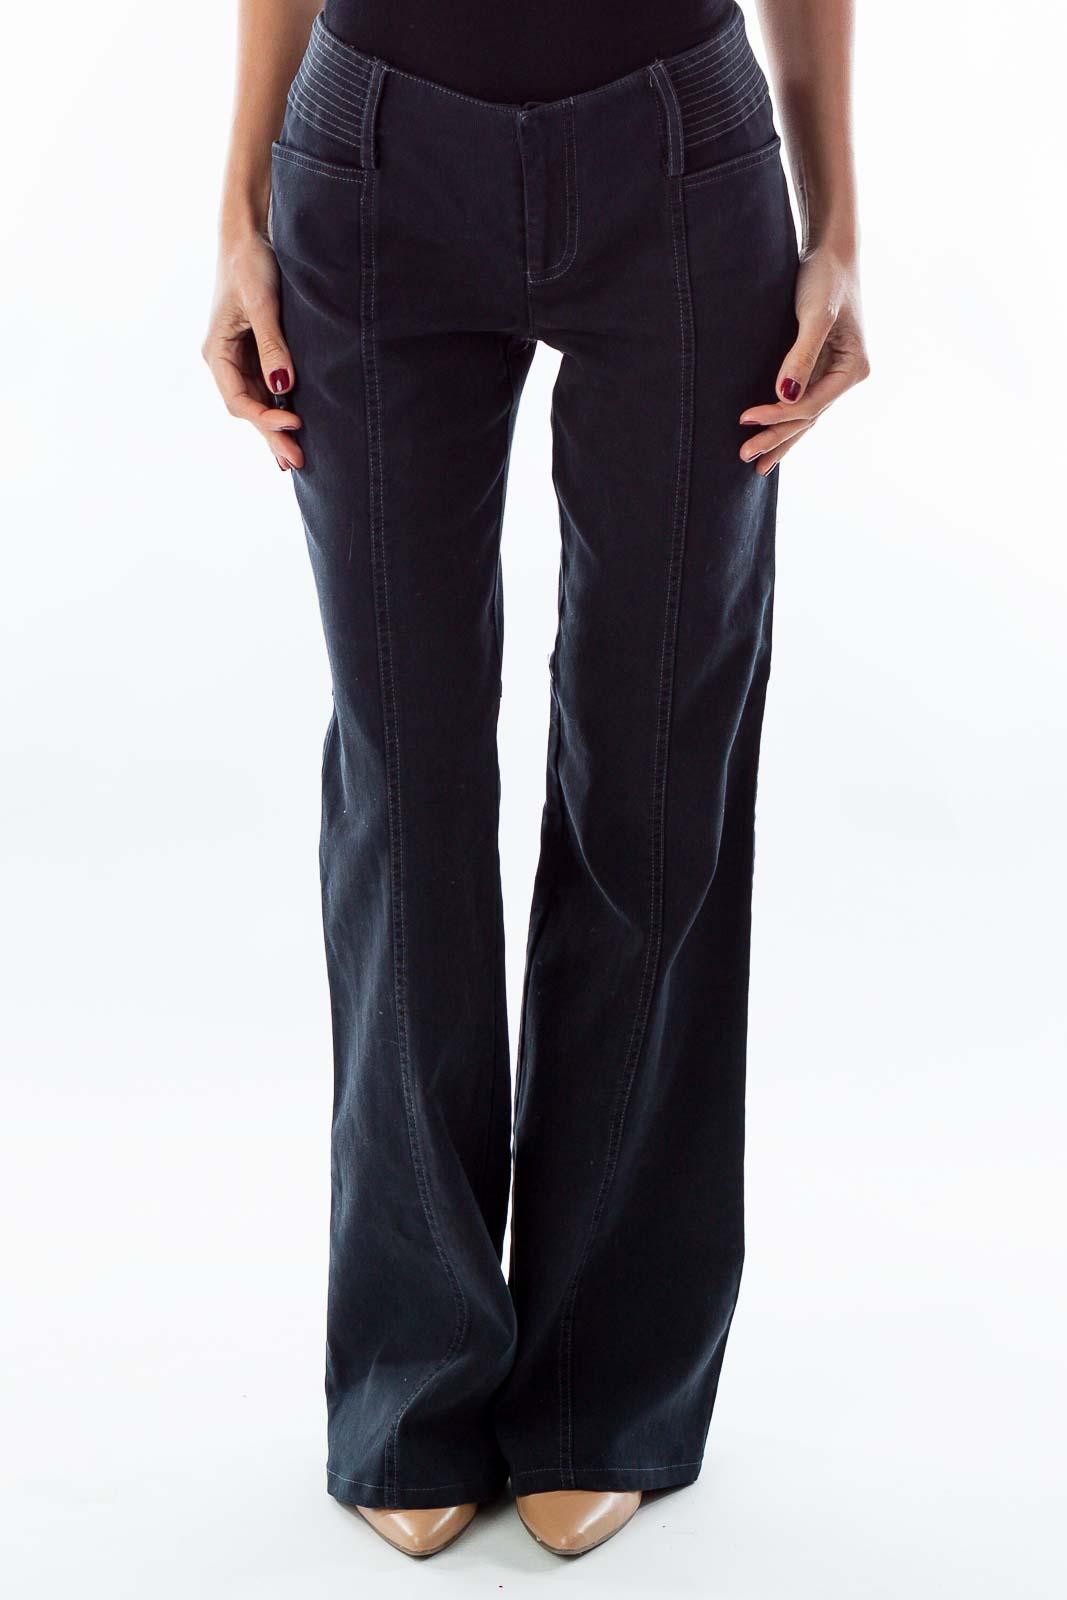 Navy Corduroy Bell-Bottom Pants Front